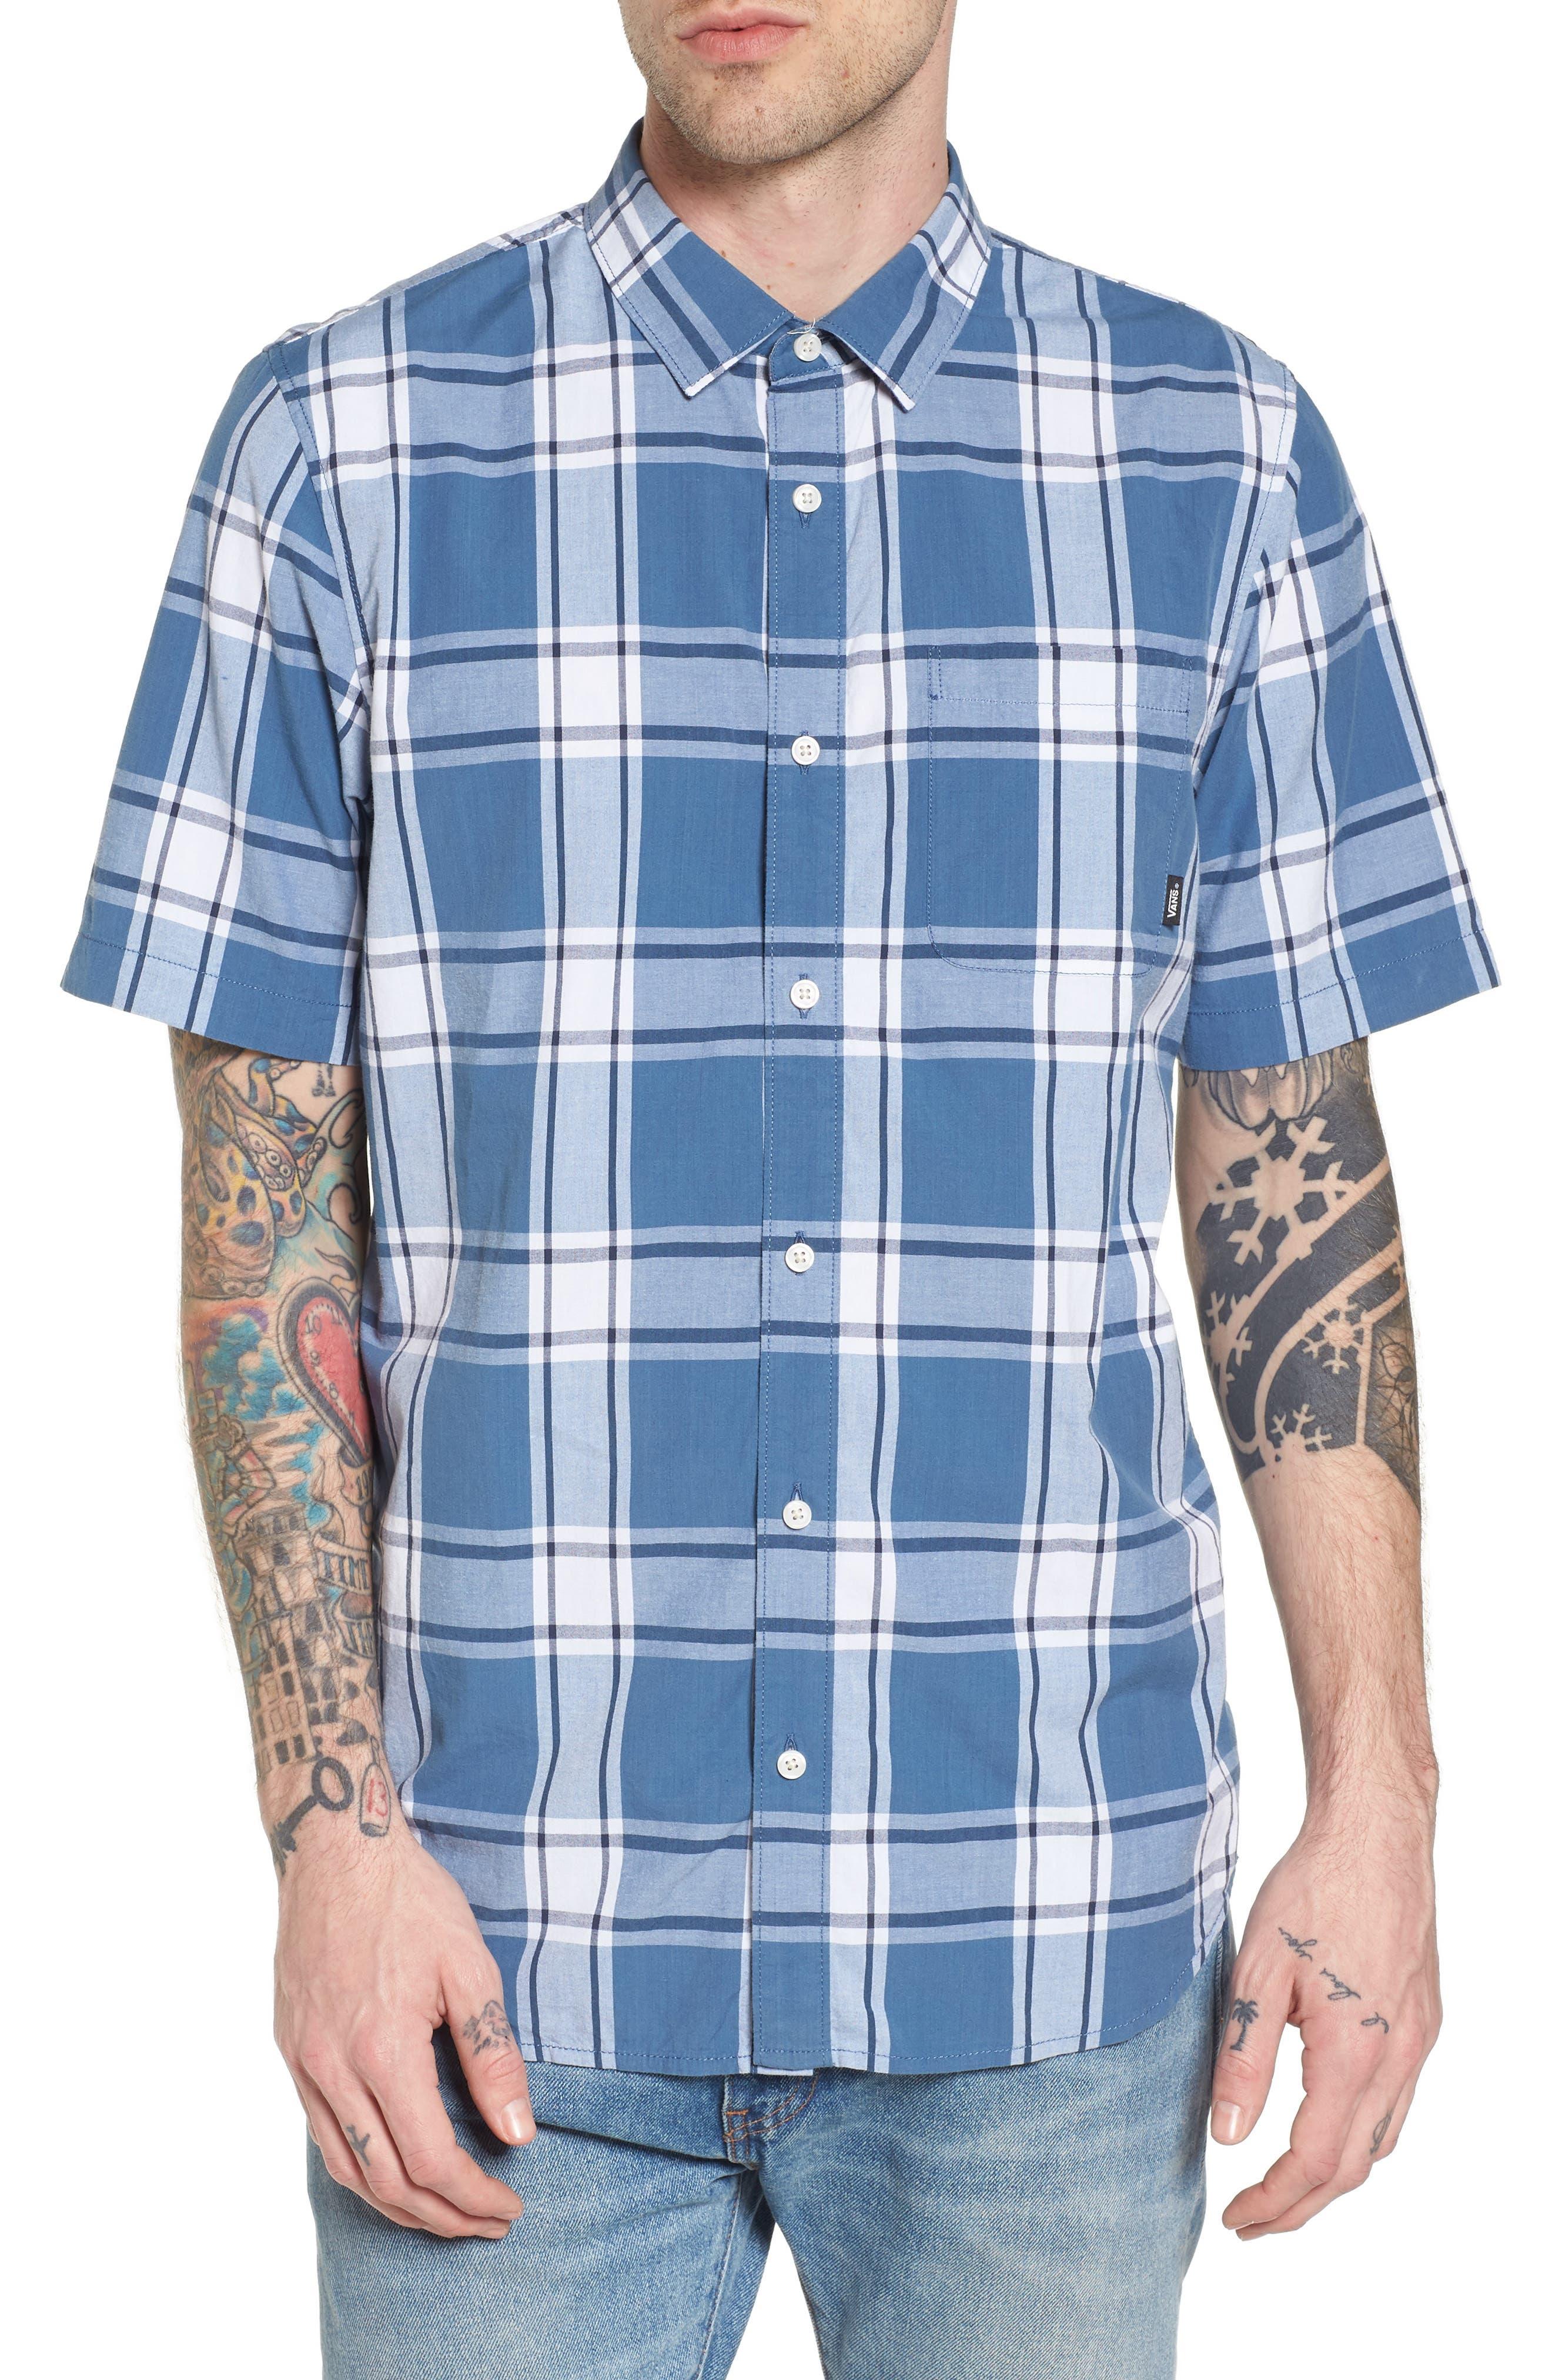 Mayfield Short Sleeve Plaid Shirt,                         Main,                         color, 420